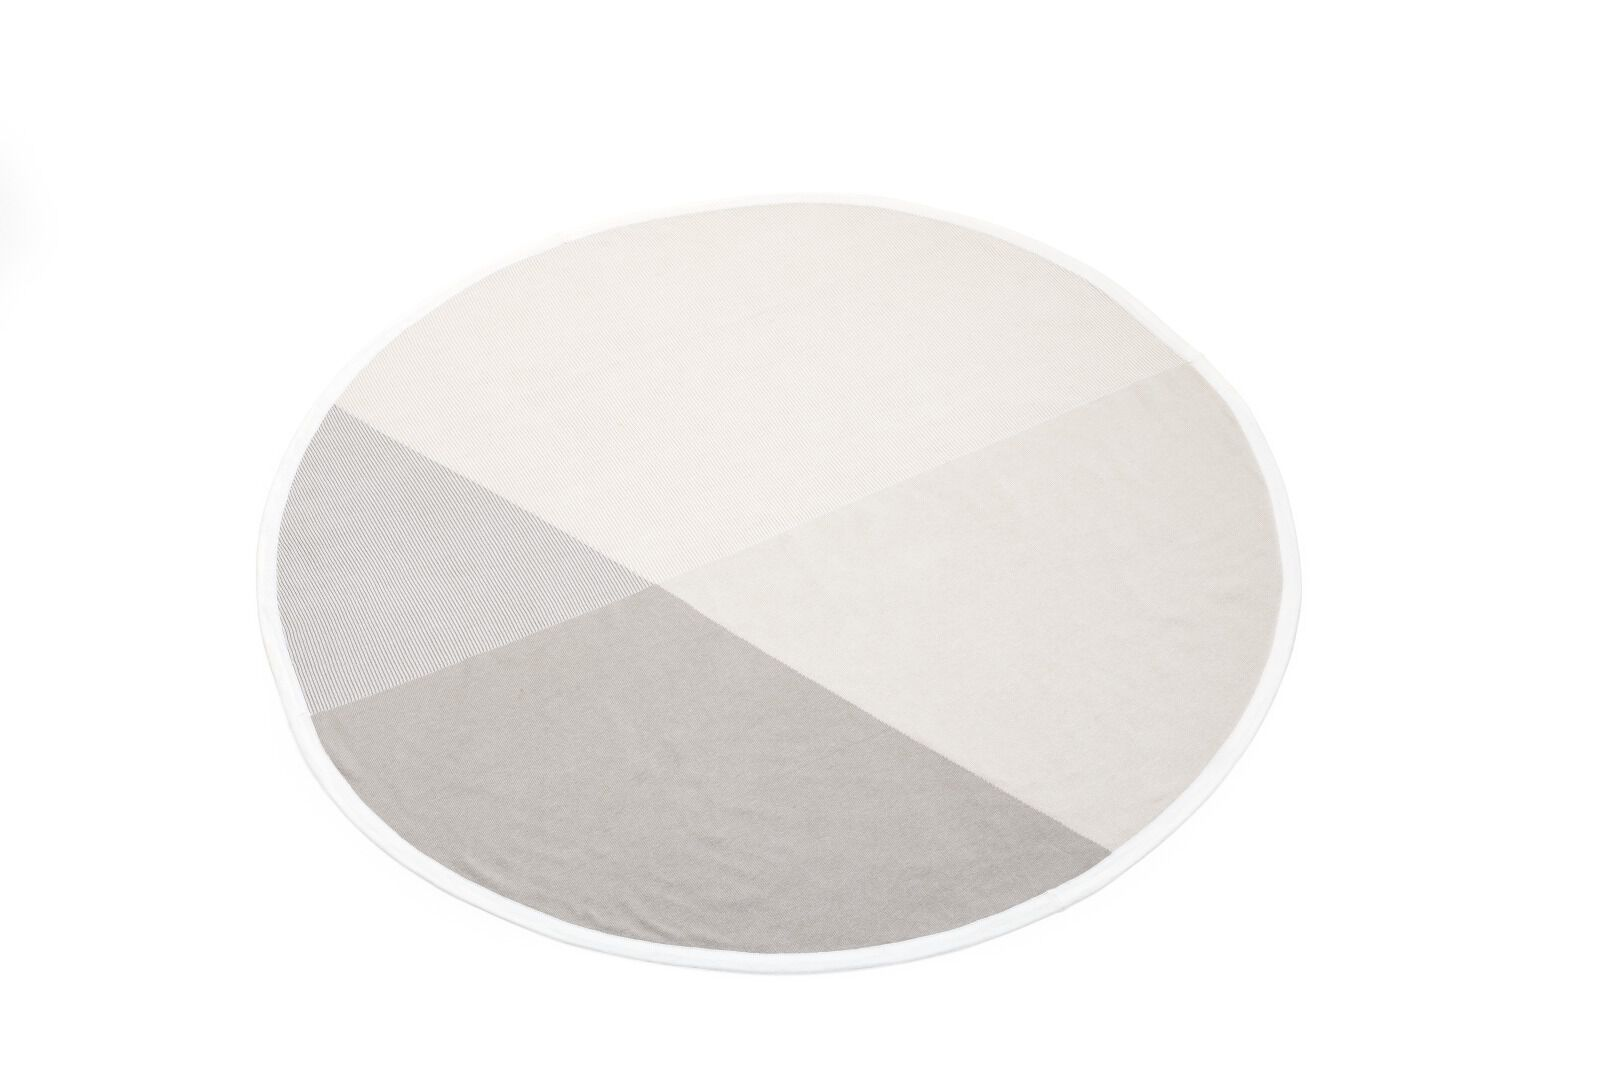 Stokke home™ cradle white